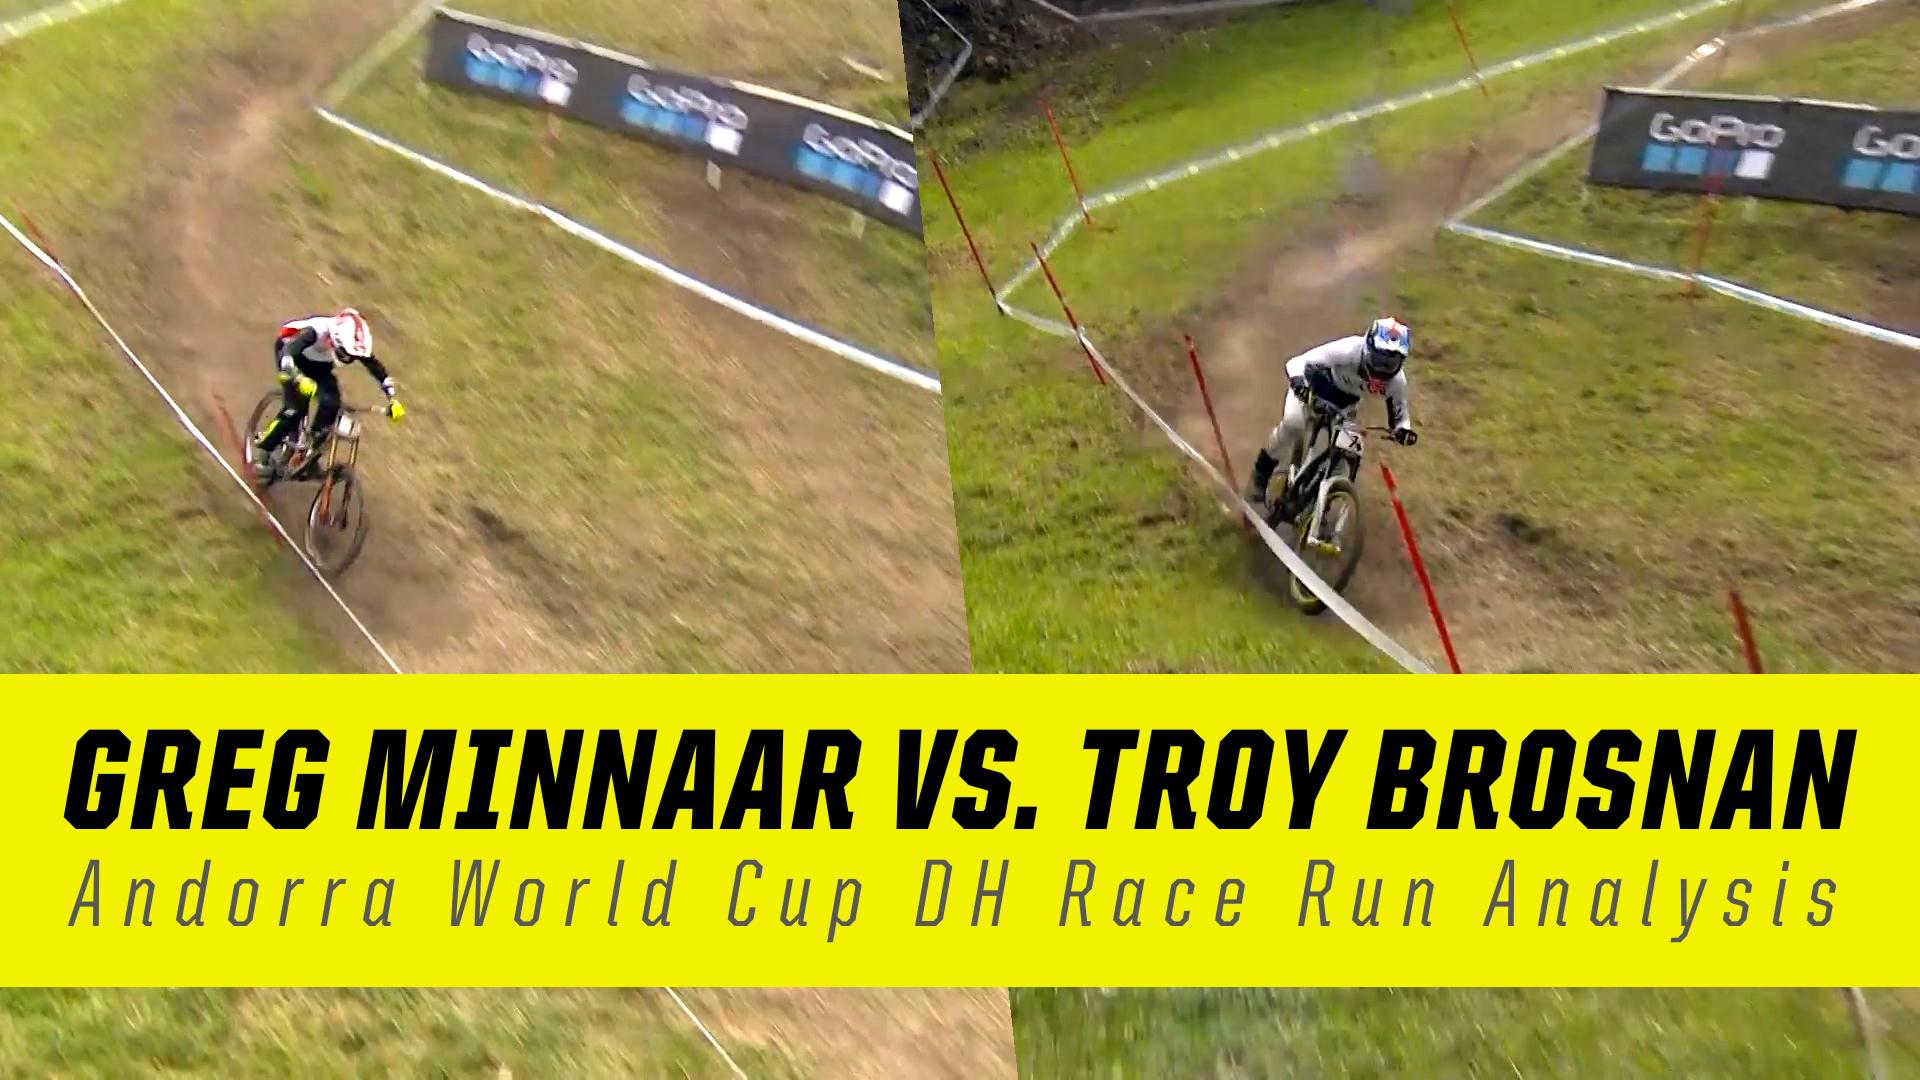 Troy Brosnan vs. Greg Minnaar - Andorra Race Run Analysis